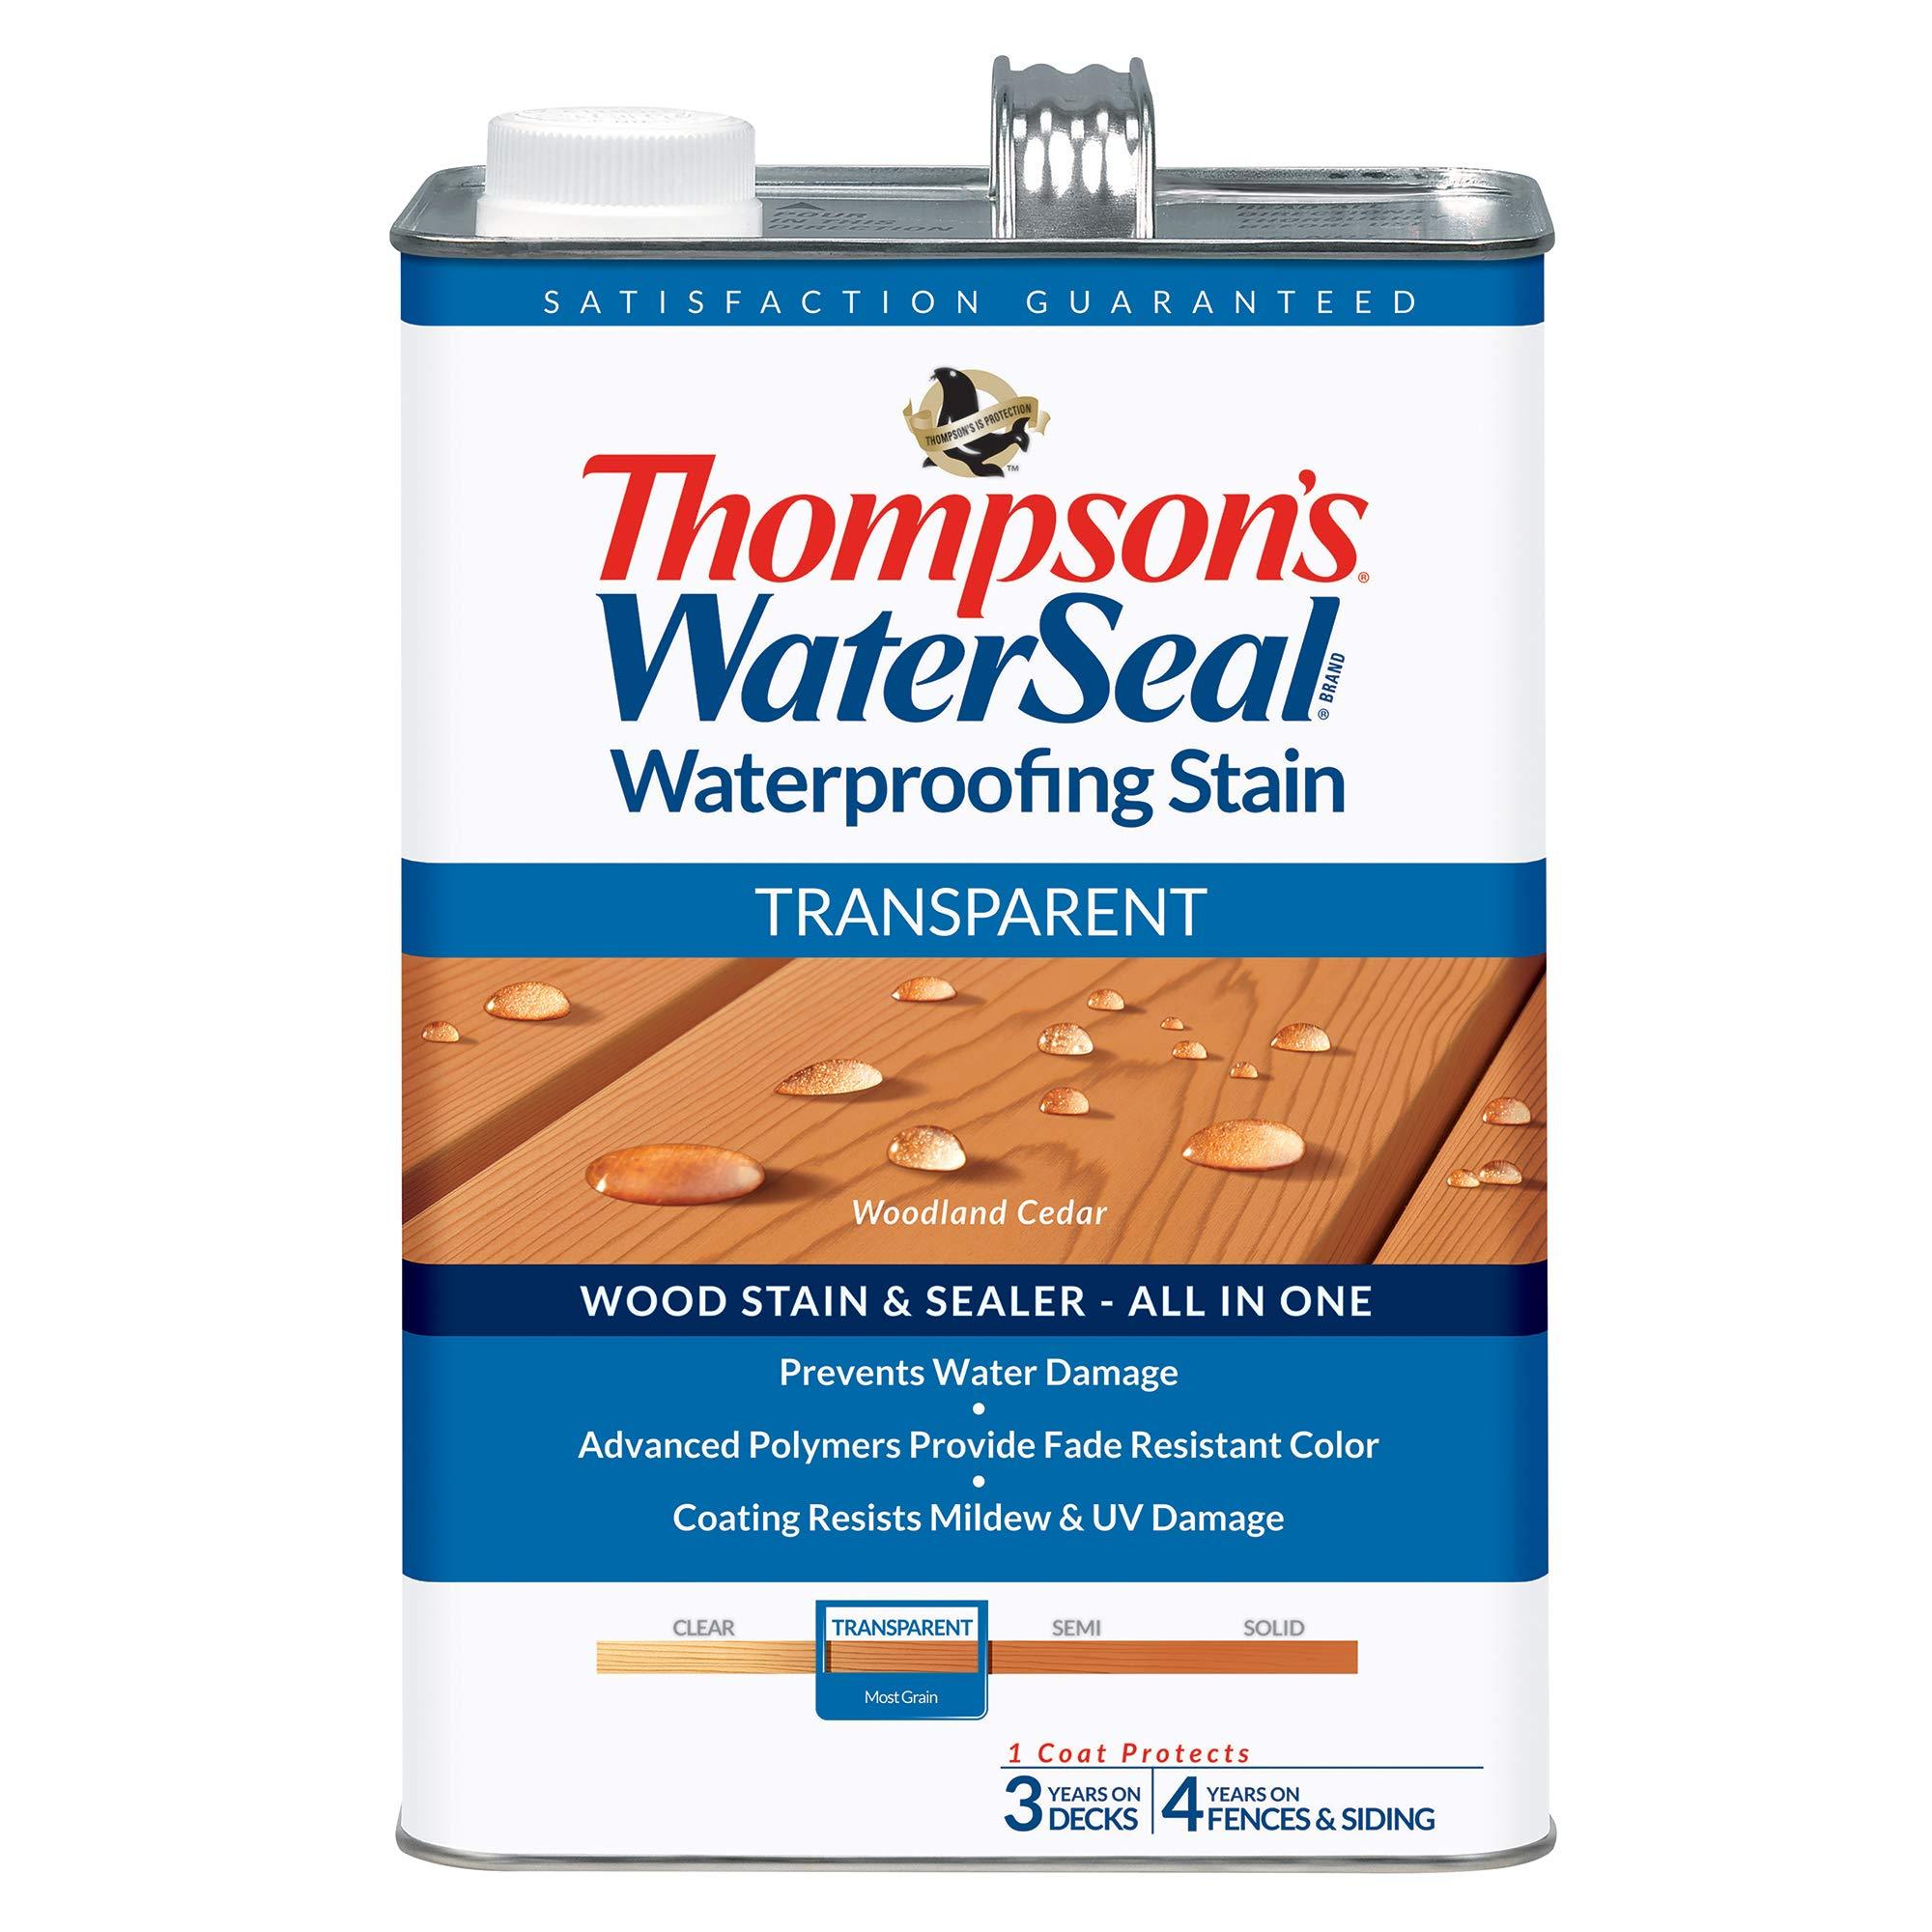 THOMPSONS WATERSEAL TH 041851 16 Transparent Waterproofing